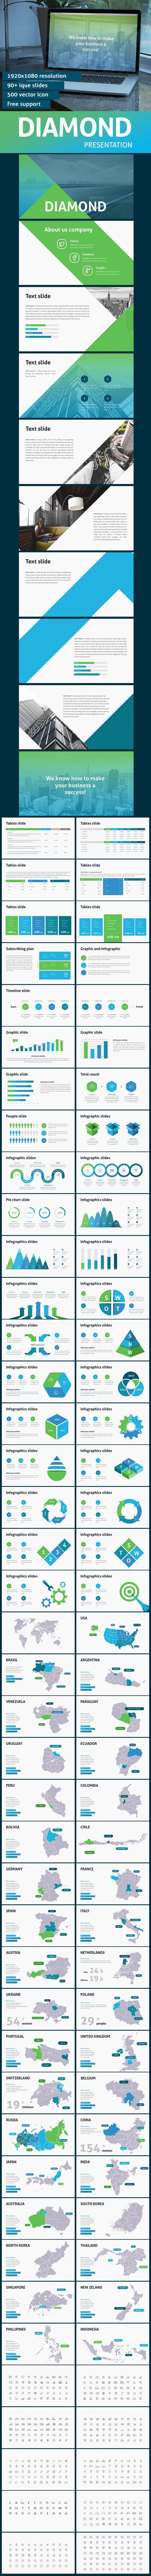 Diamond Keynote presentation — Keynote KEY #agency #diagram • Download ➝ https://graphicriver.net/item/diamond-keynote-presentation/18828241?ref=pxcr